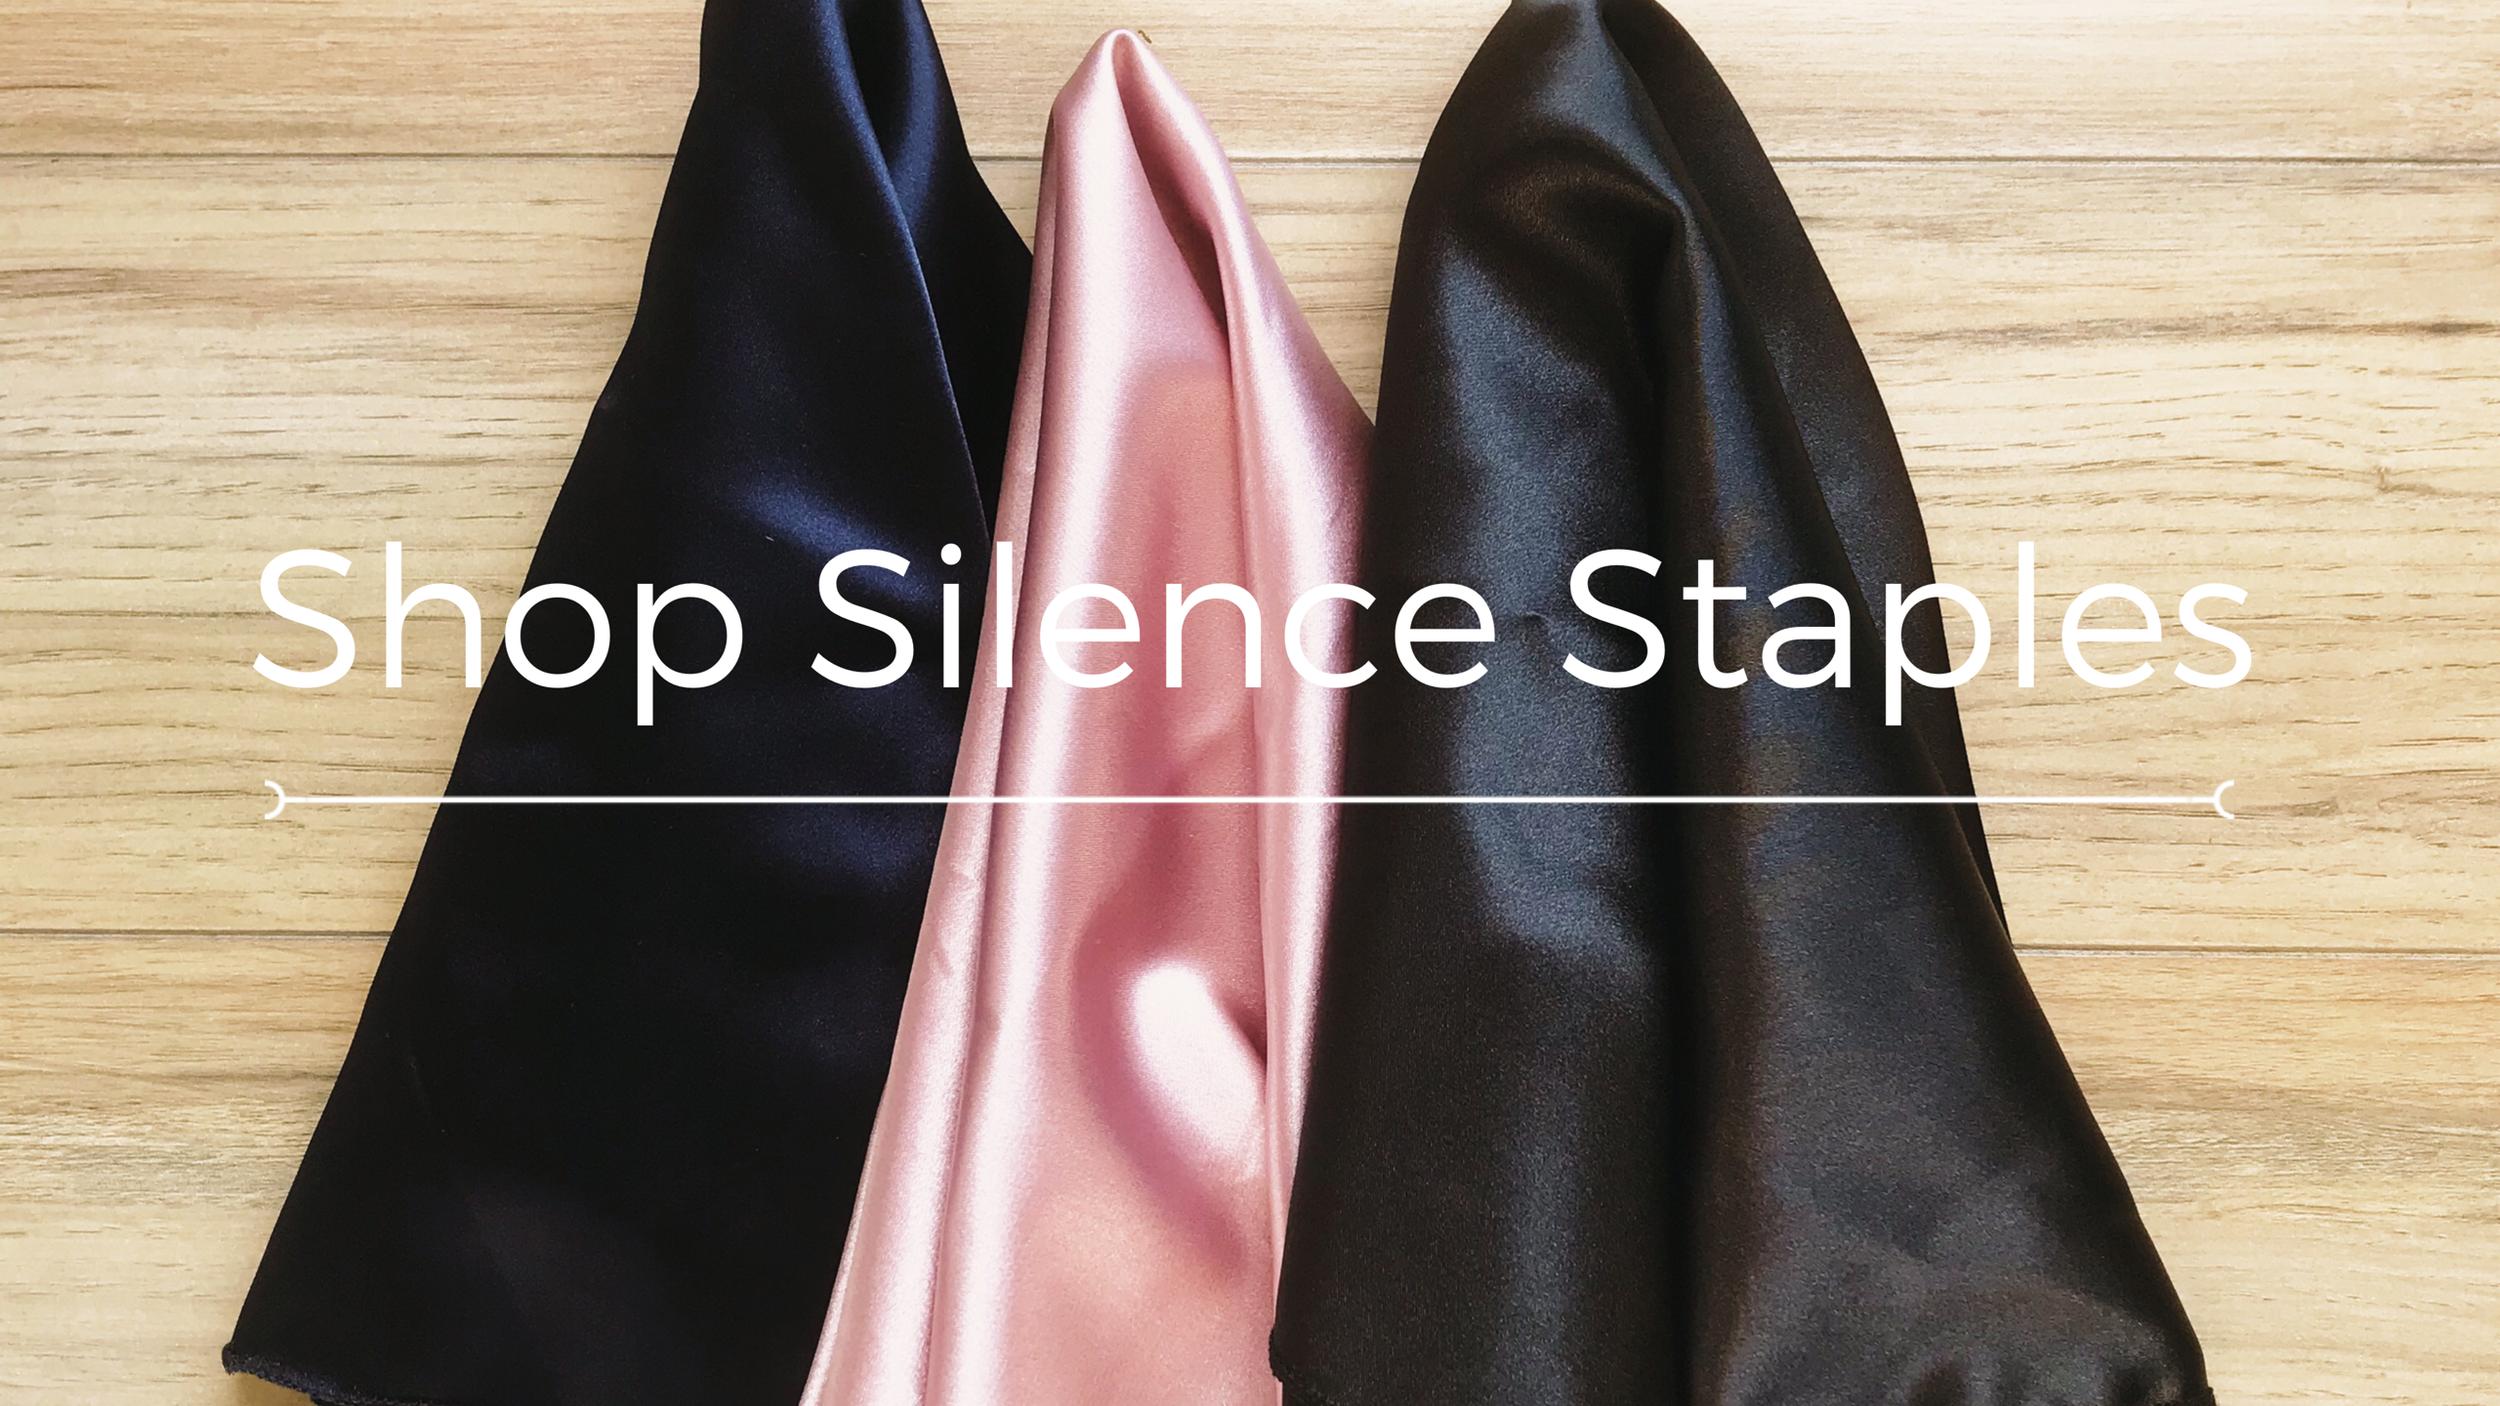 Shop Silence Staples